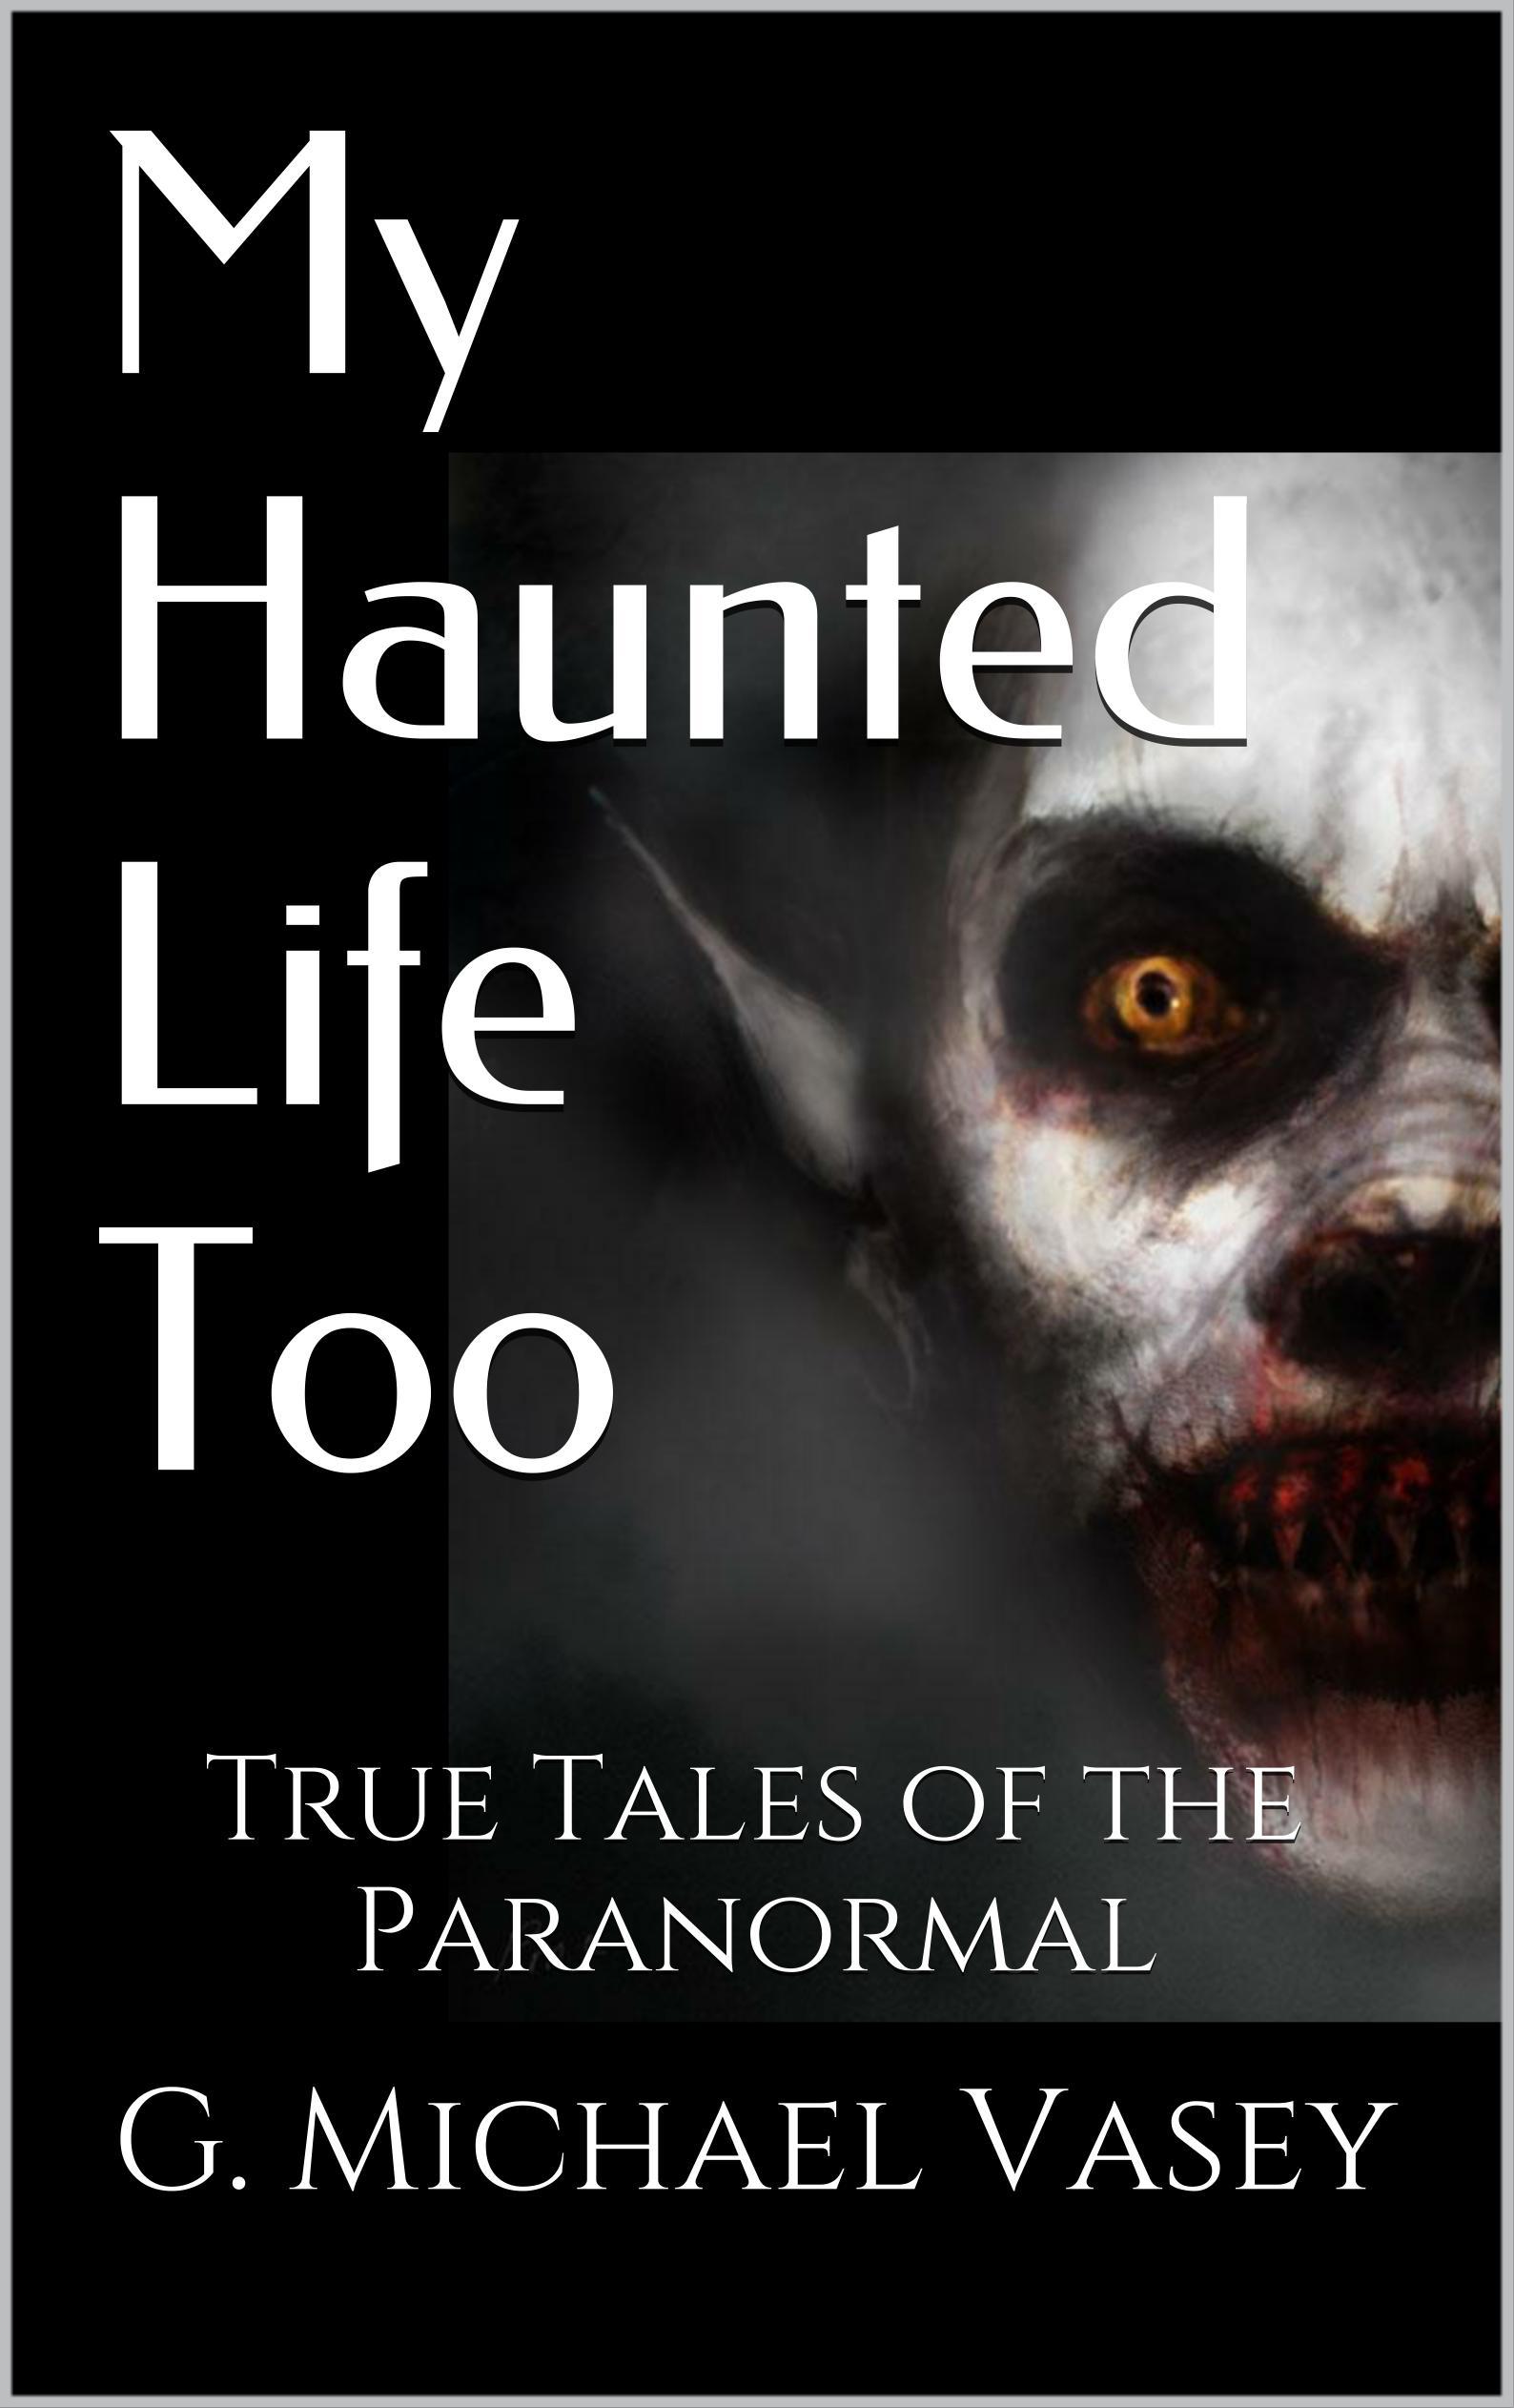 My Haunted Life Too